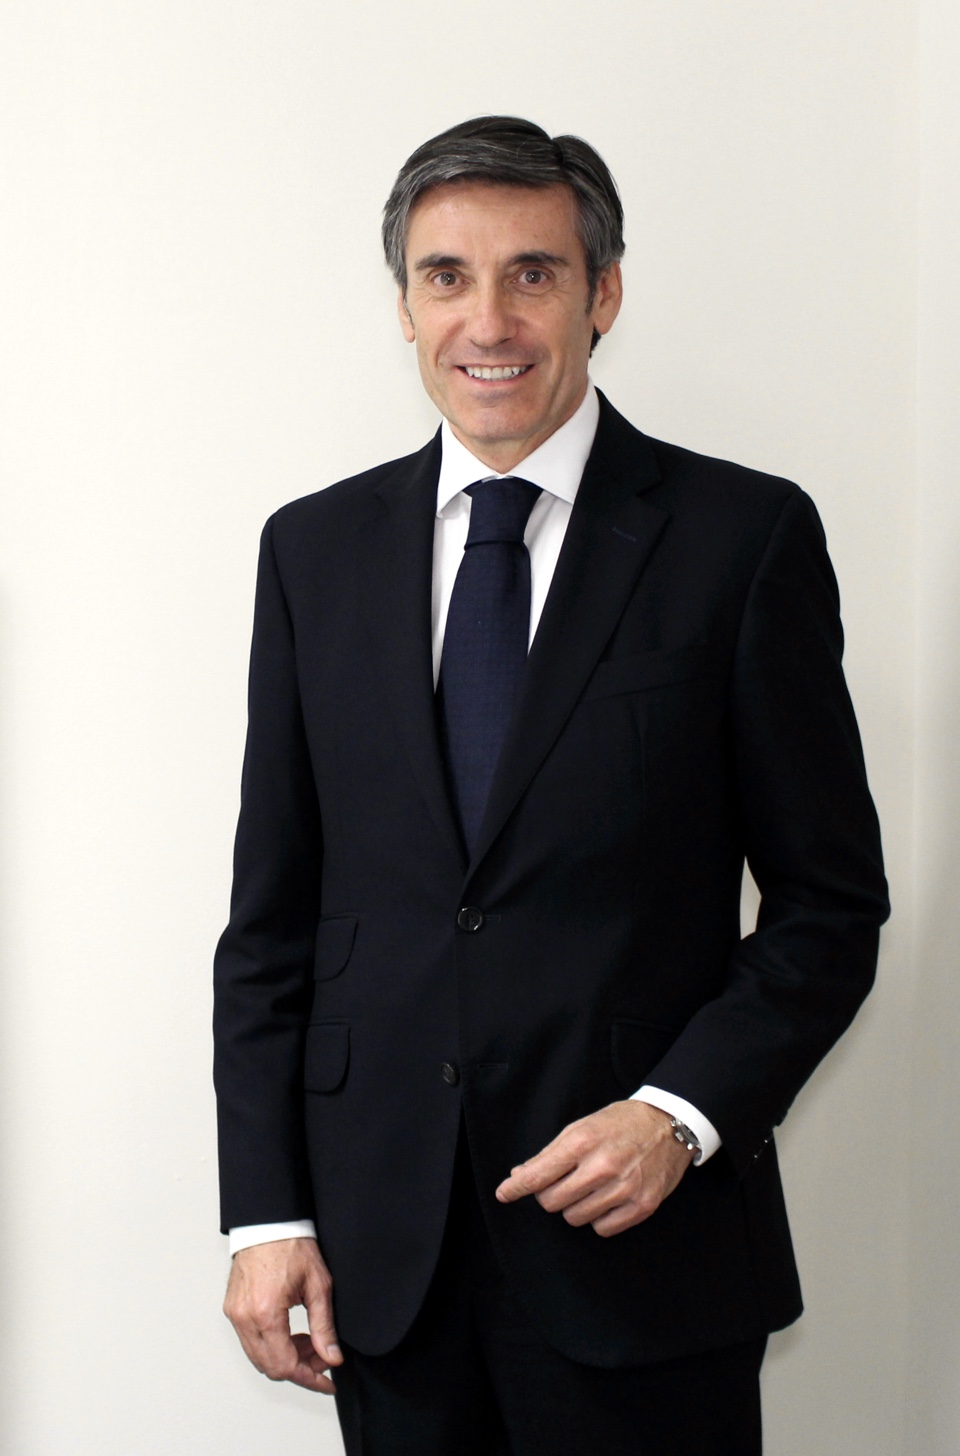 Javier Manuel Flores Moreno